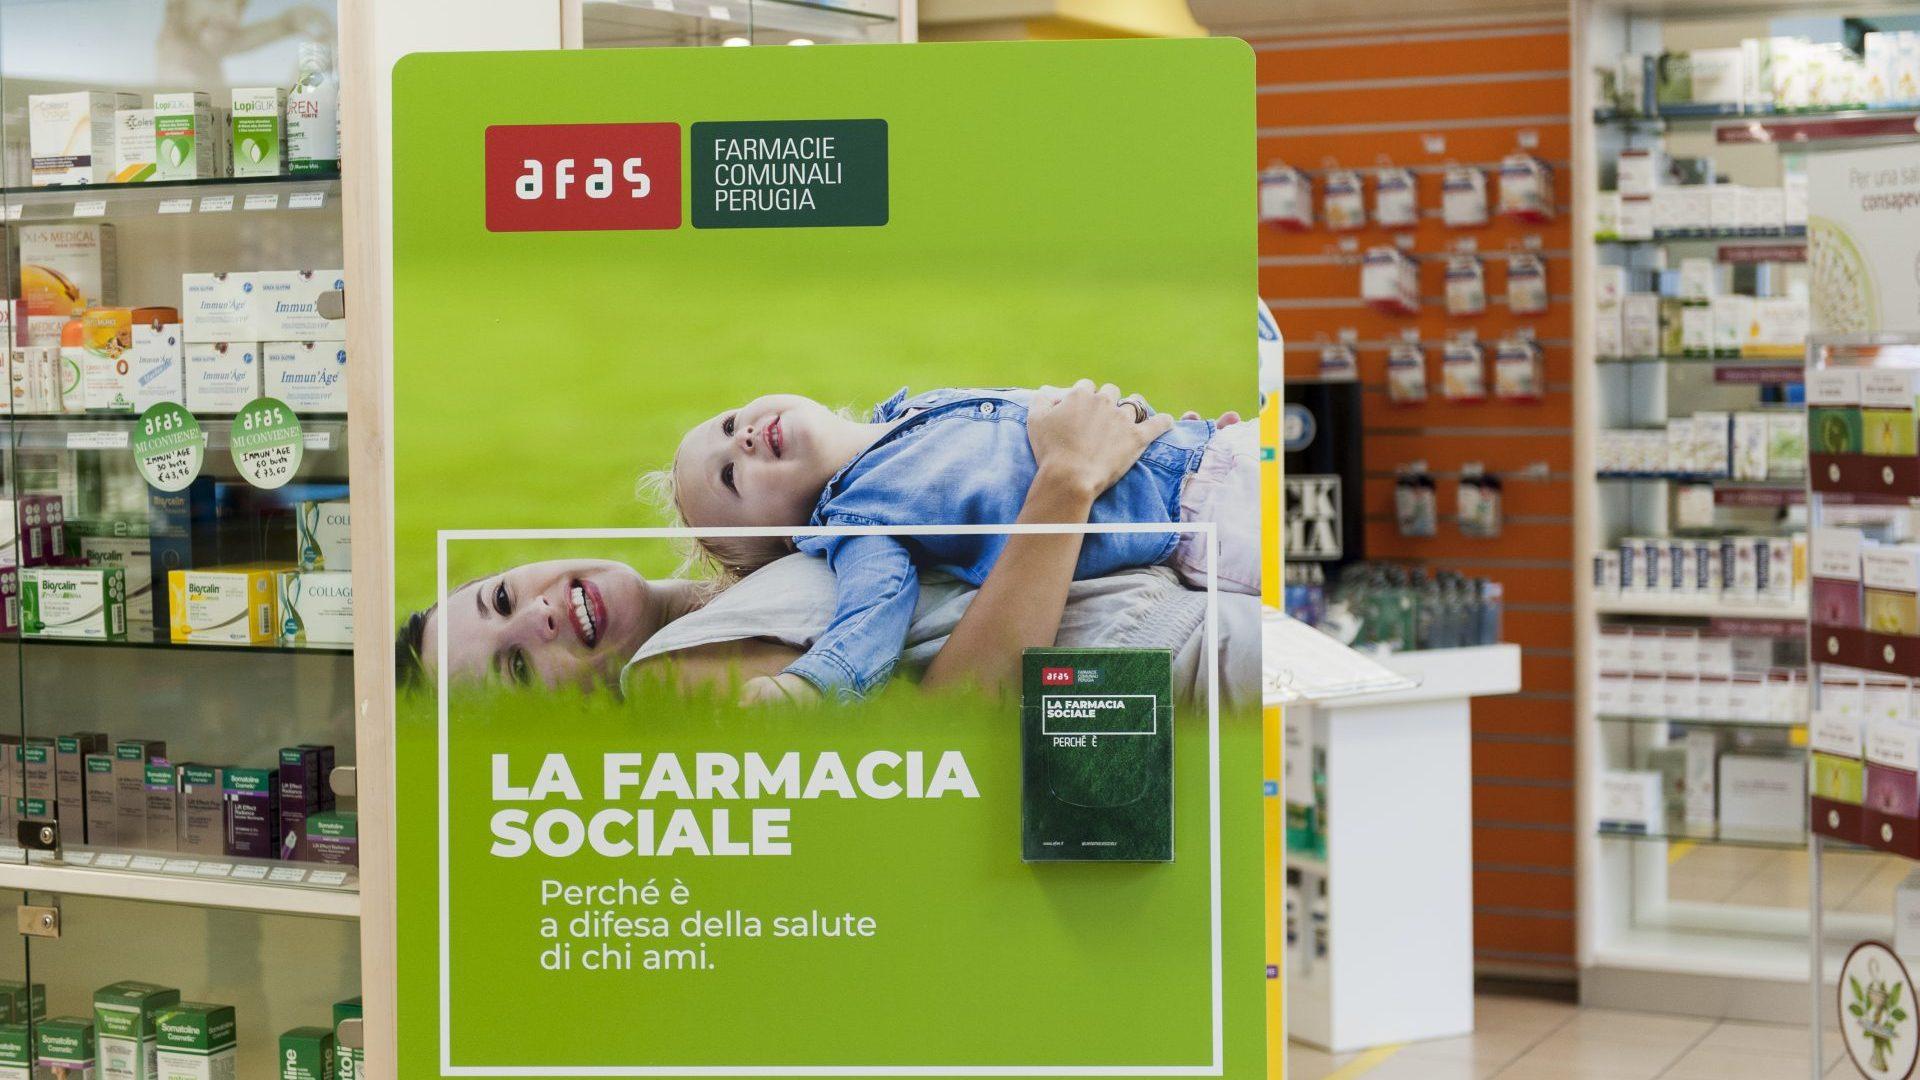 Farmacia Comunale AFAS n.1 Pallotta - 12